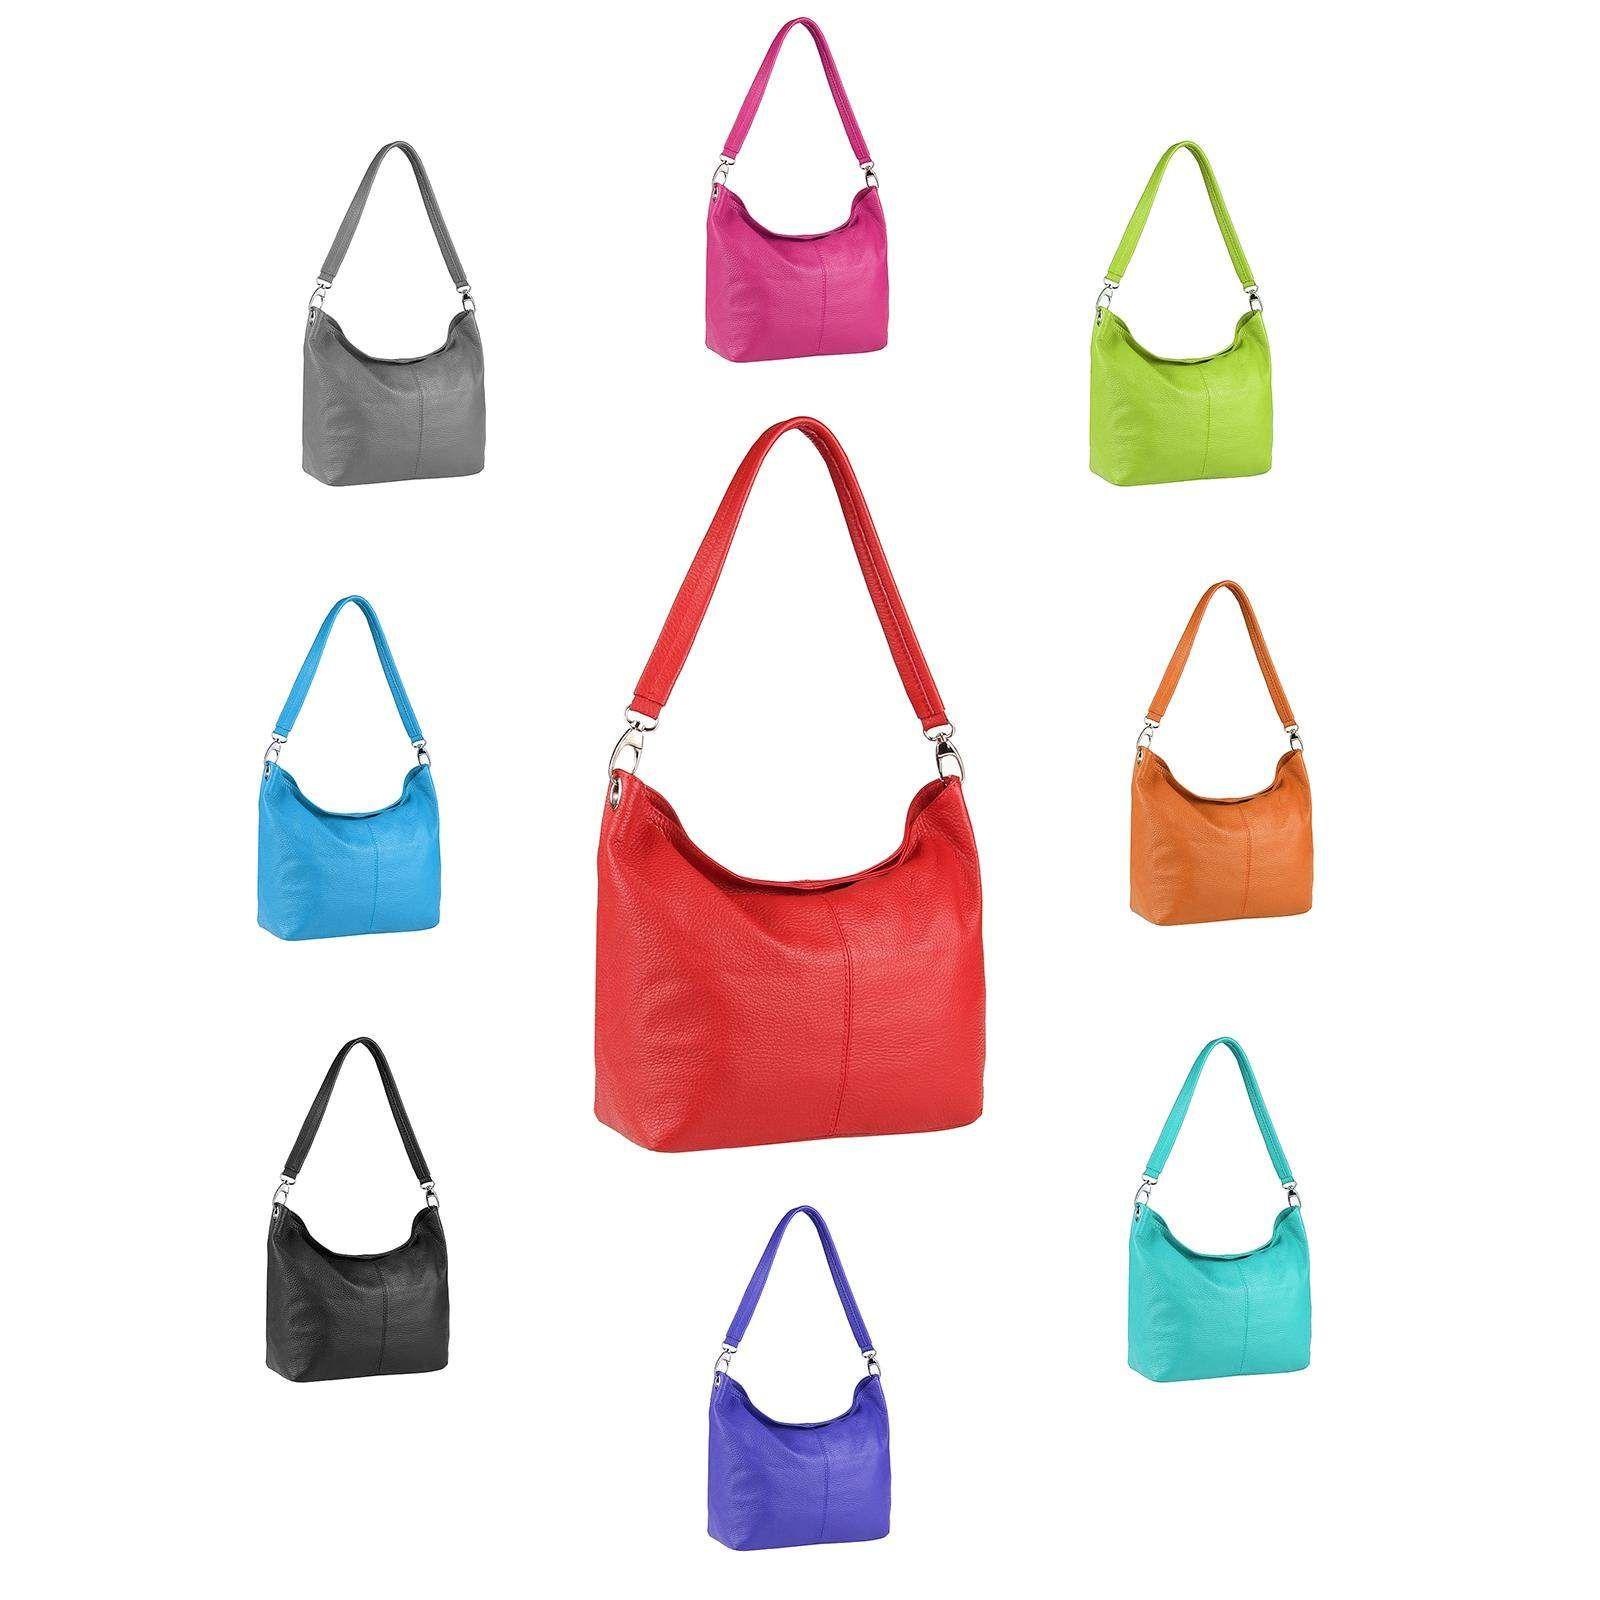 OBC Made in Italy DAMEN LEDER TASCHE SHOPPER Handtasche Hobo